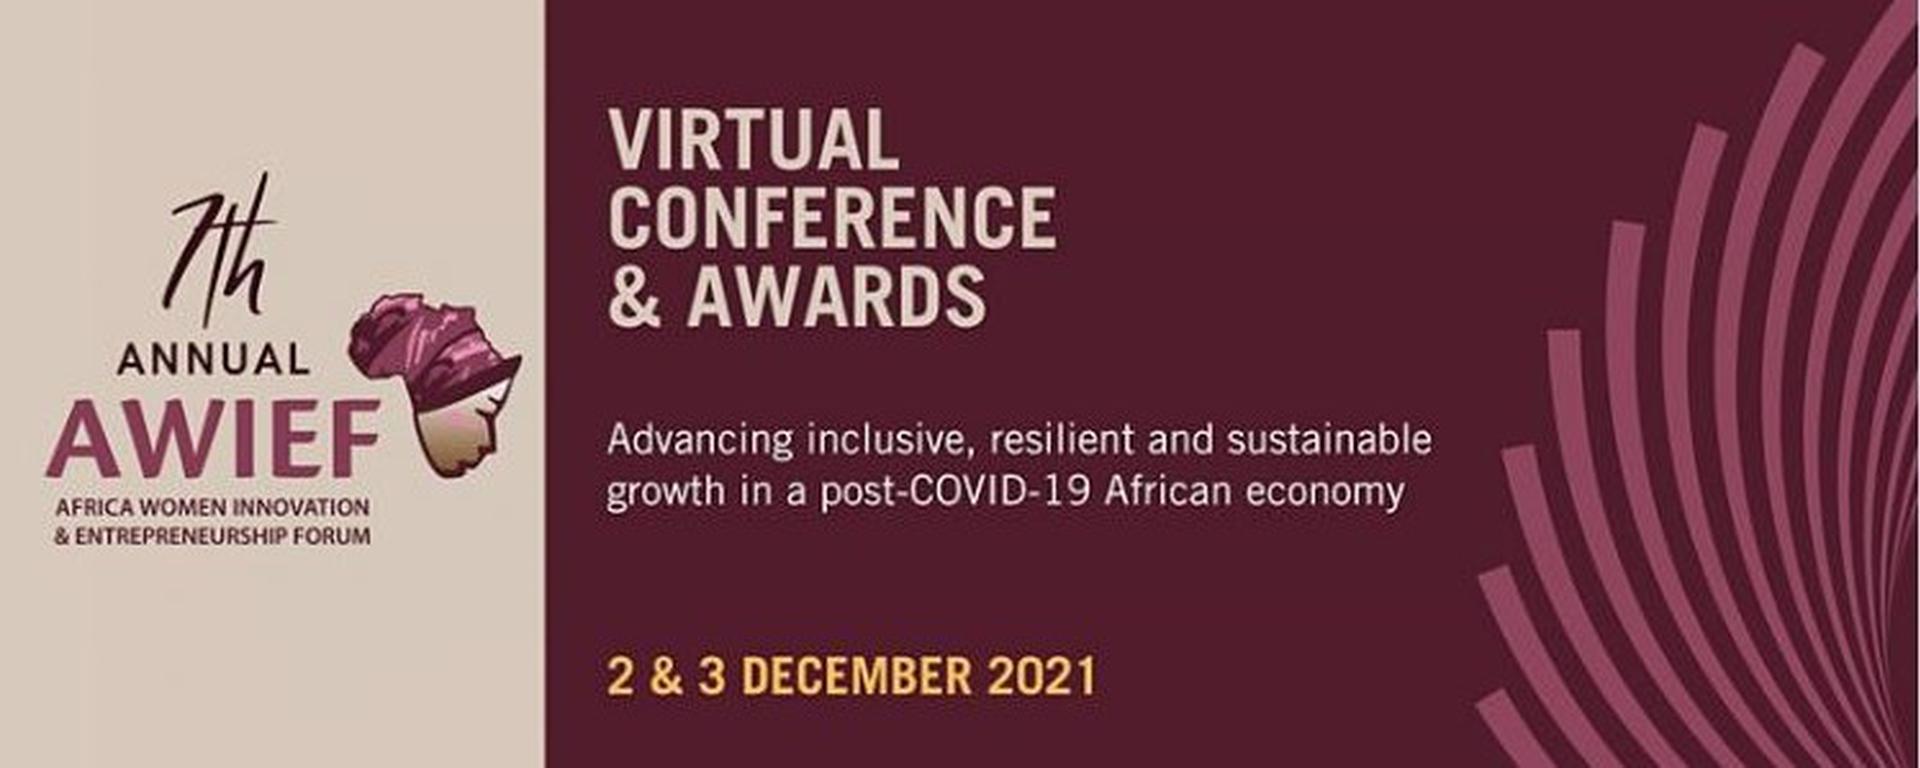 Africa Women Innovation and Entrepreneurship Forum - 7th Africa Women Innovation and Entrepreneurship Forum Movemeback African event cover image